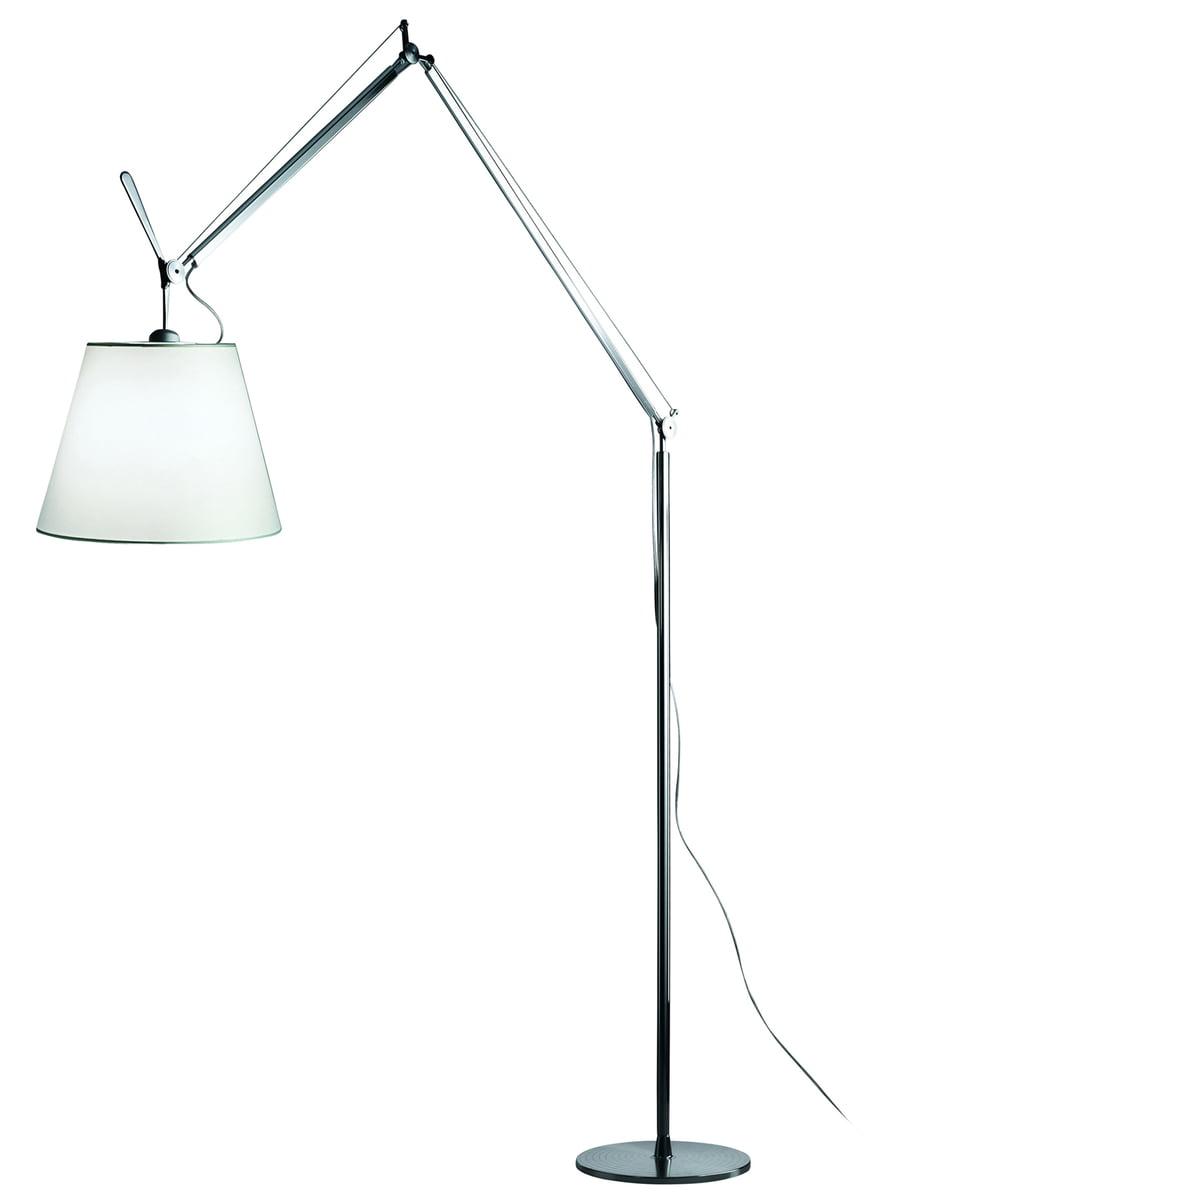 tolomeo mega terra lampadaire de artemide. Black Bedroom Furniture Sets. Home Design Ideas